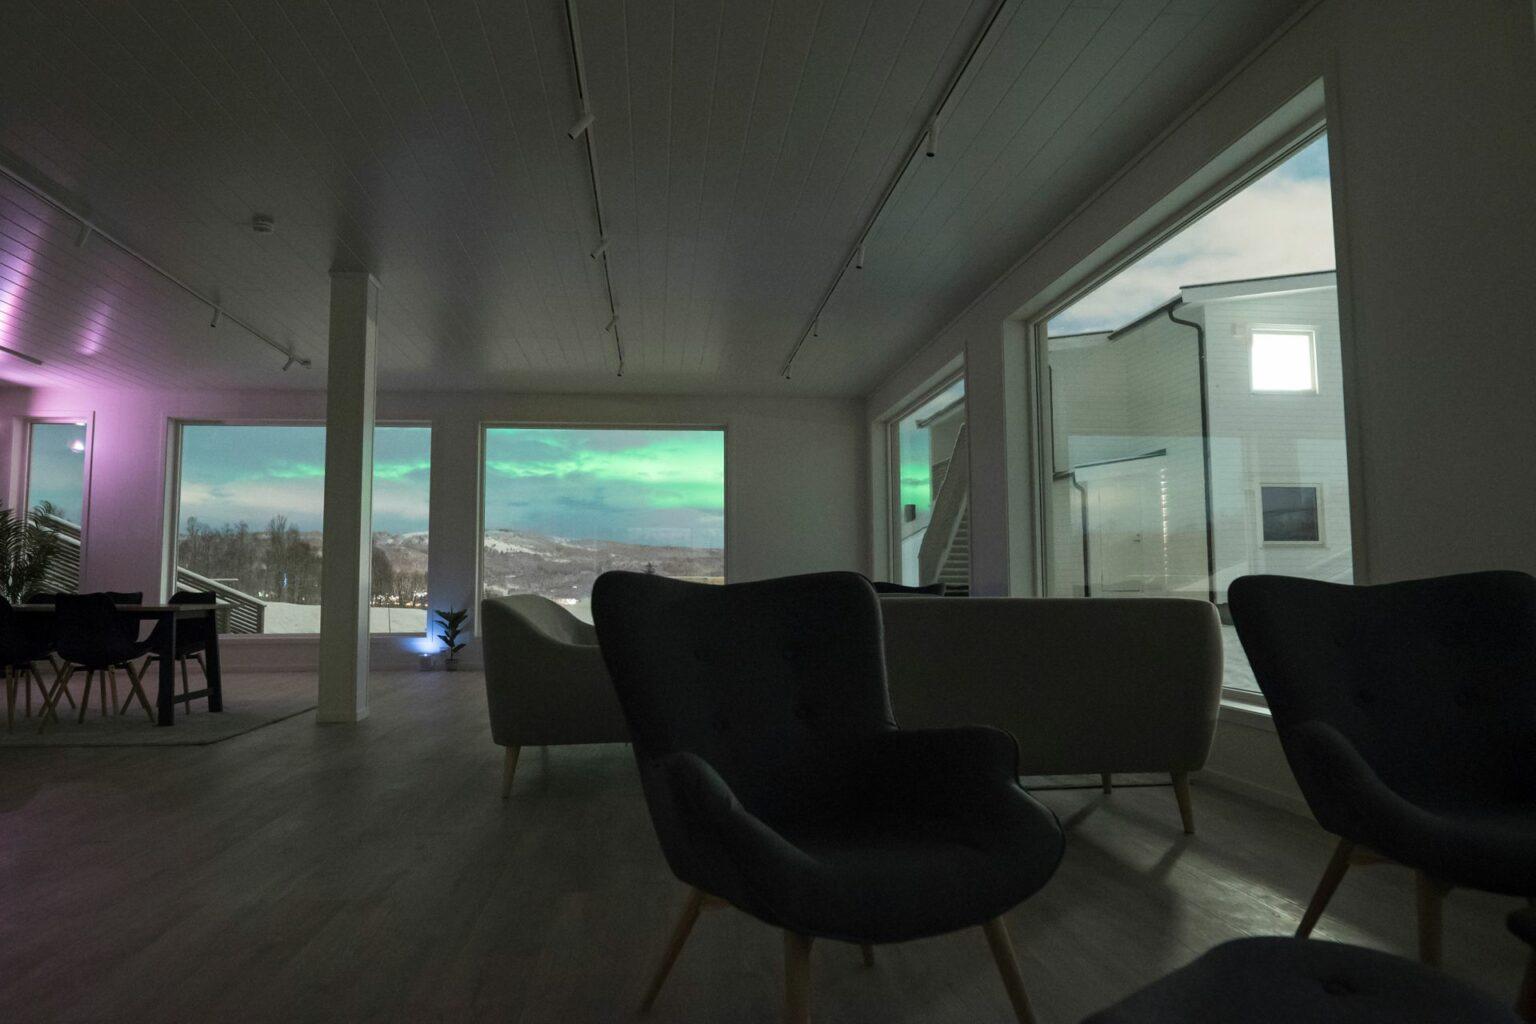 Aurora Borealis seen from aurora lounge